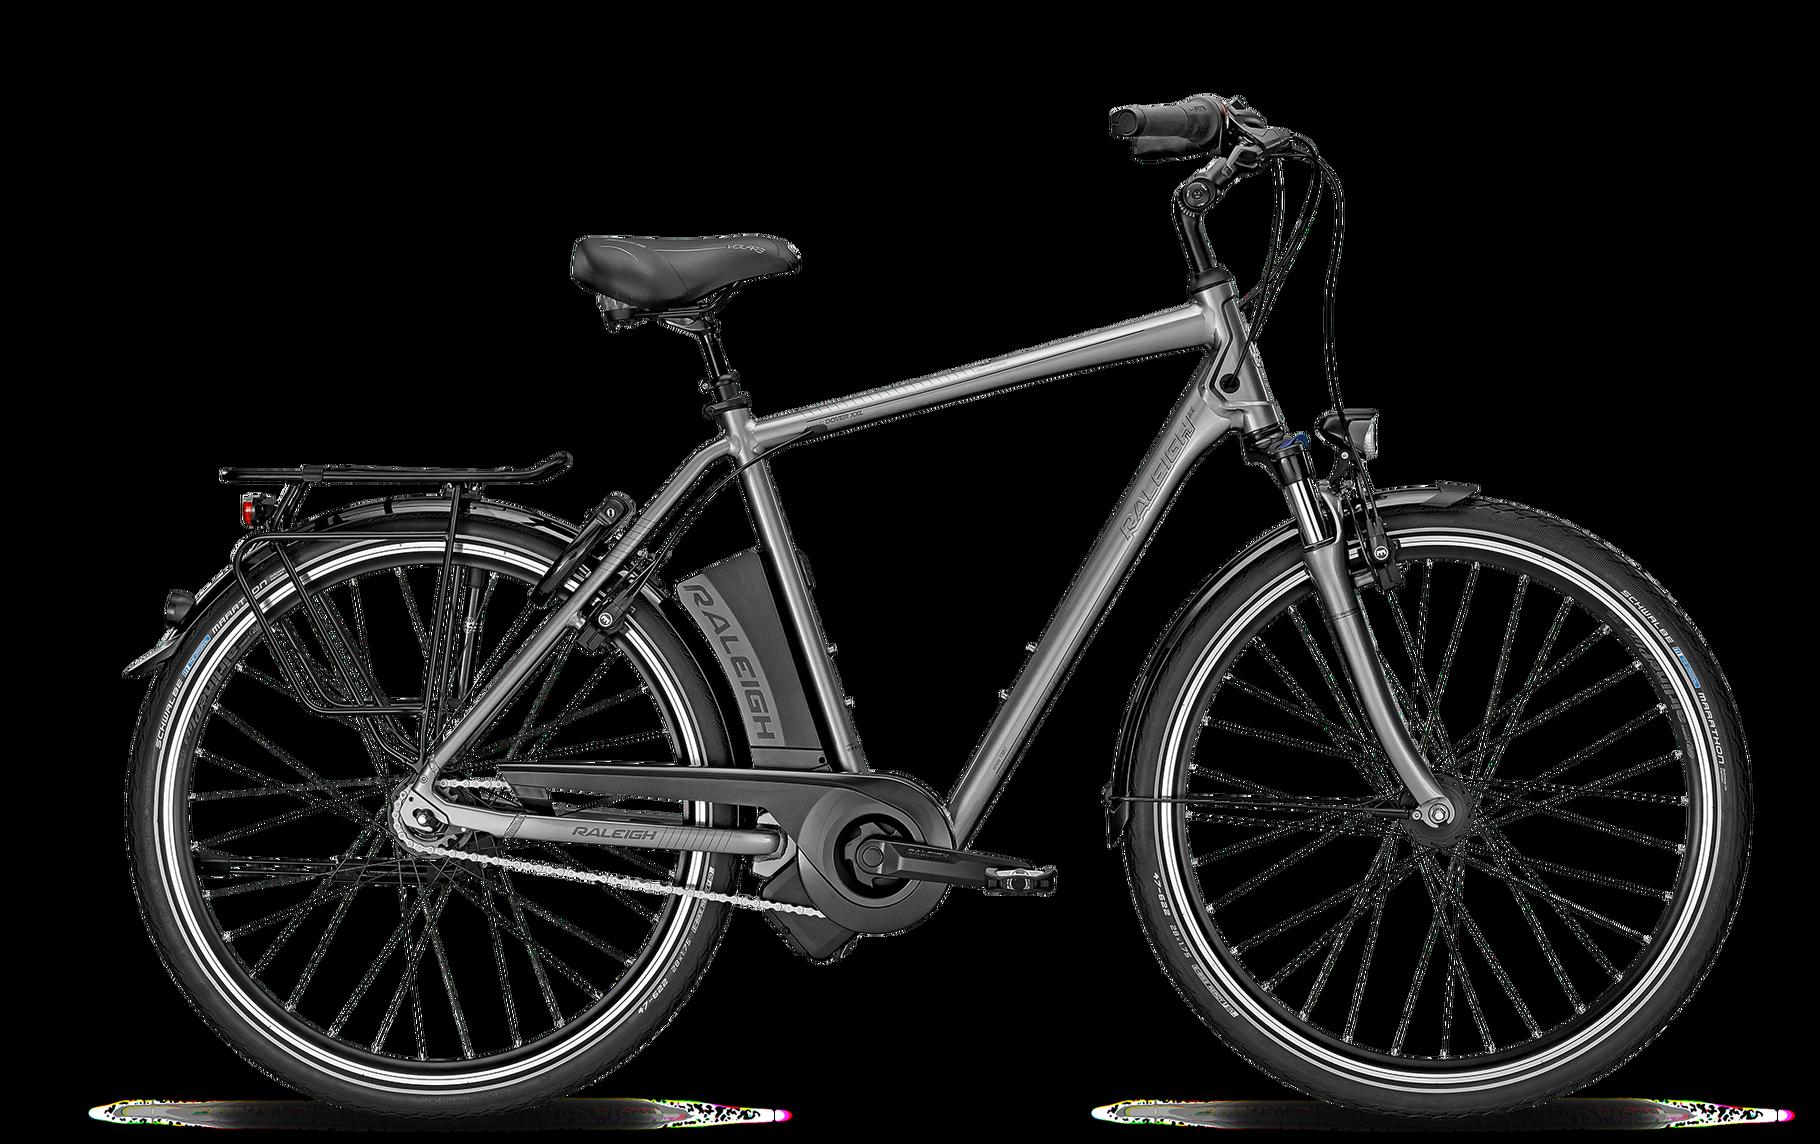 raleigh dover impulse xxl 2016 ebike bis 170 kg e motion. Black Bedroom Furniture Sets. Home Design Ideas